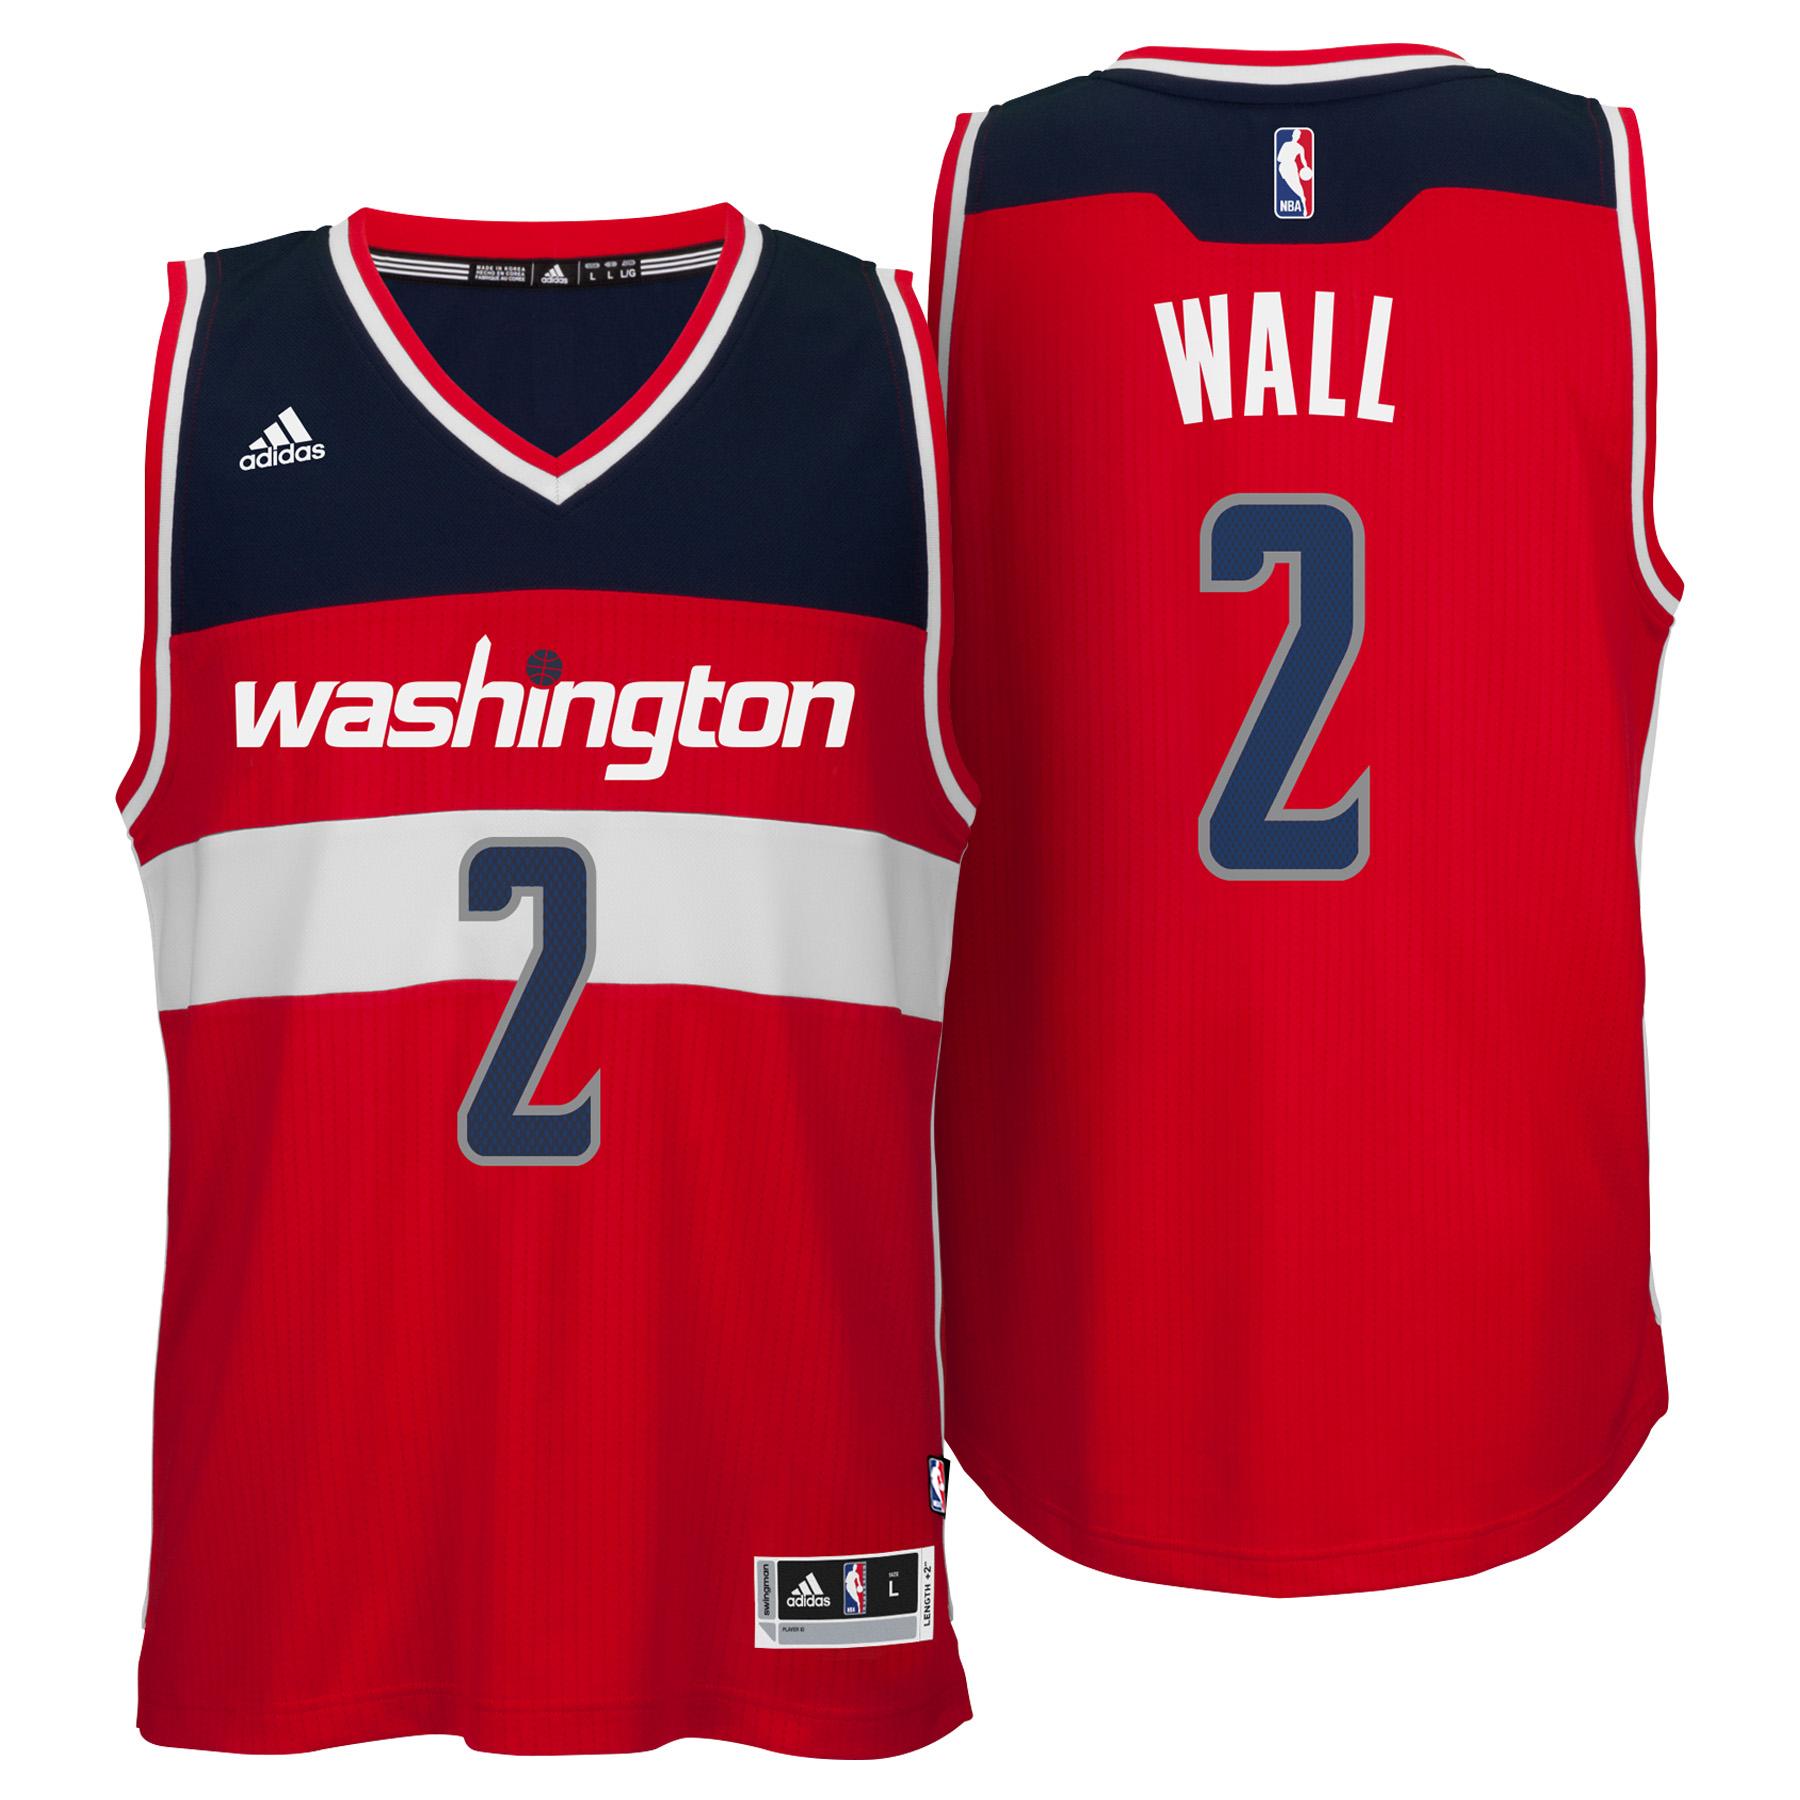 Washington Wizards Road Swingman Jersey - John Wall - Mens